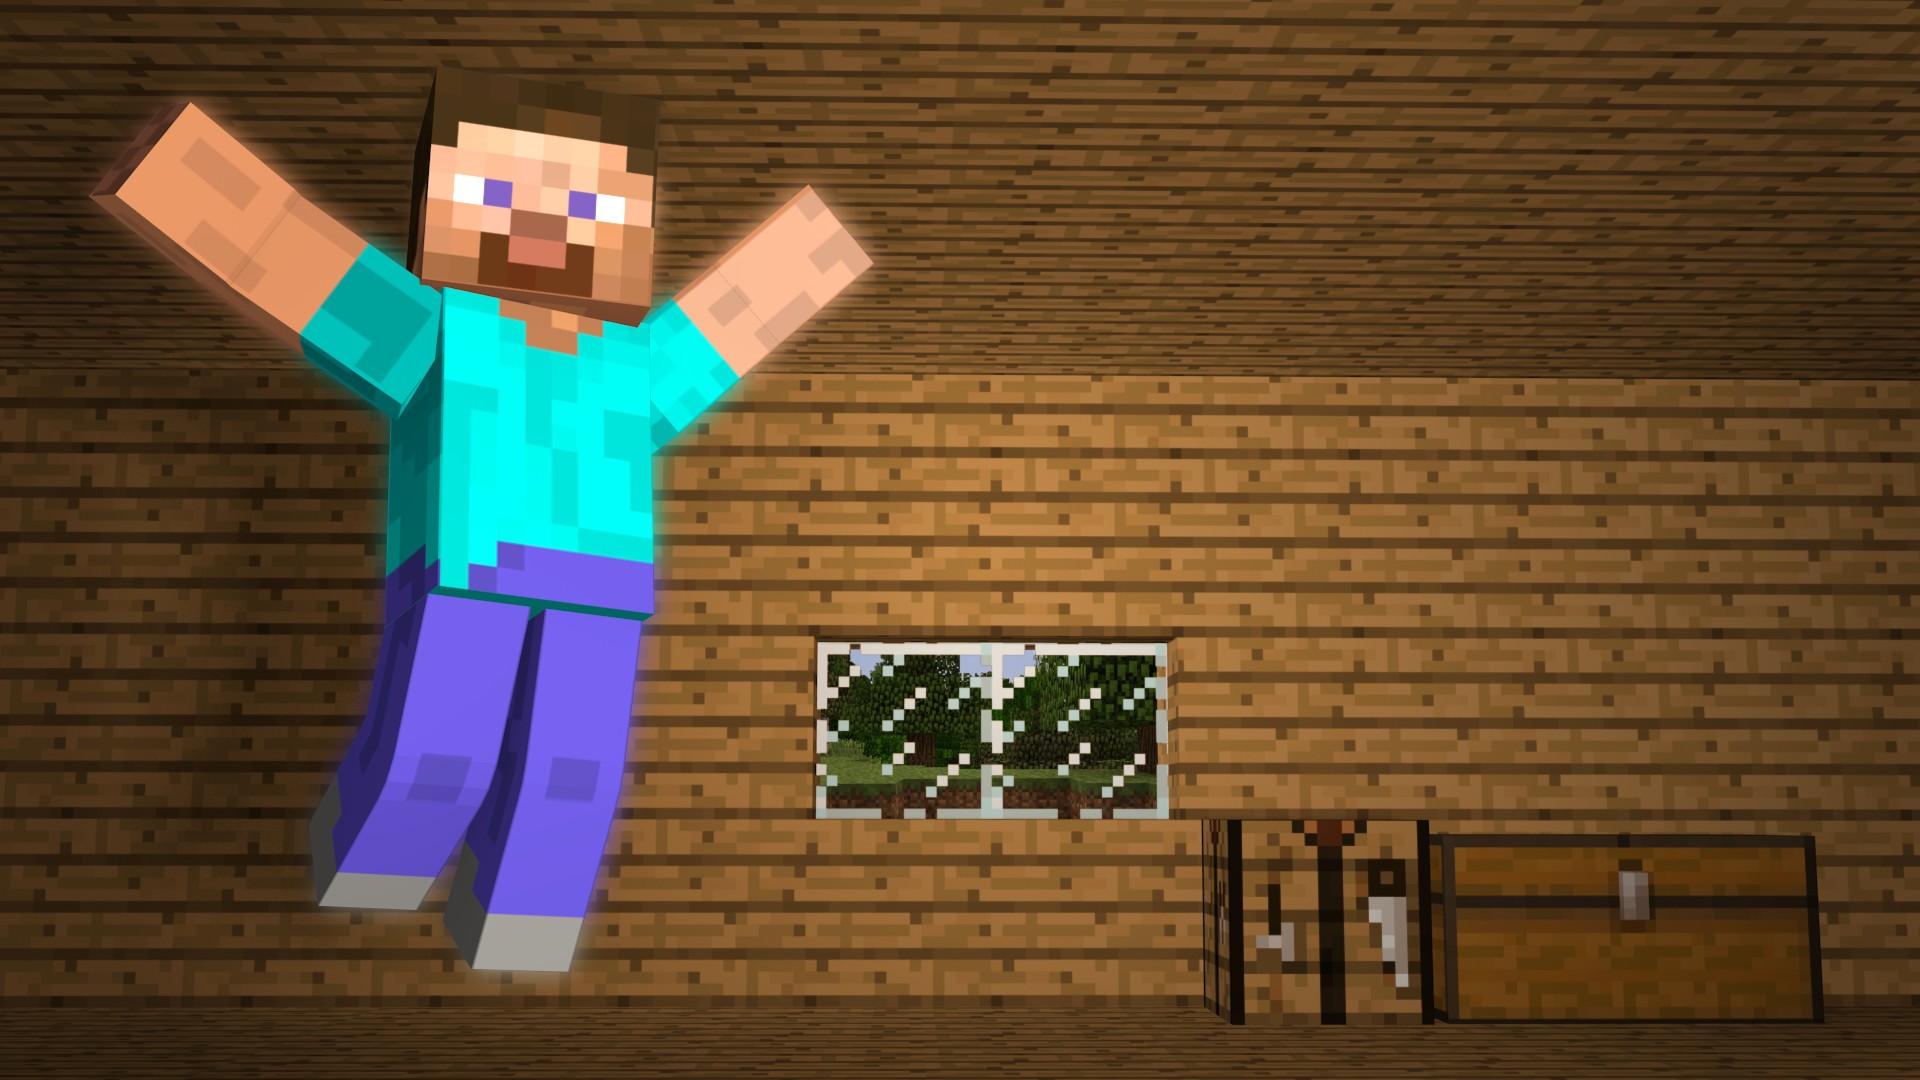 Steve Minecraft Wallpaper 45165 1920x1080px